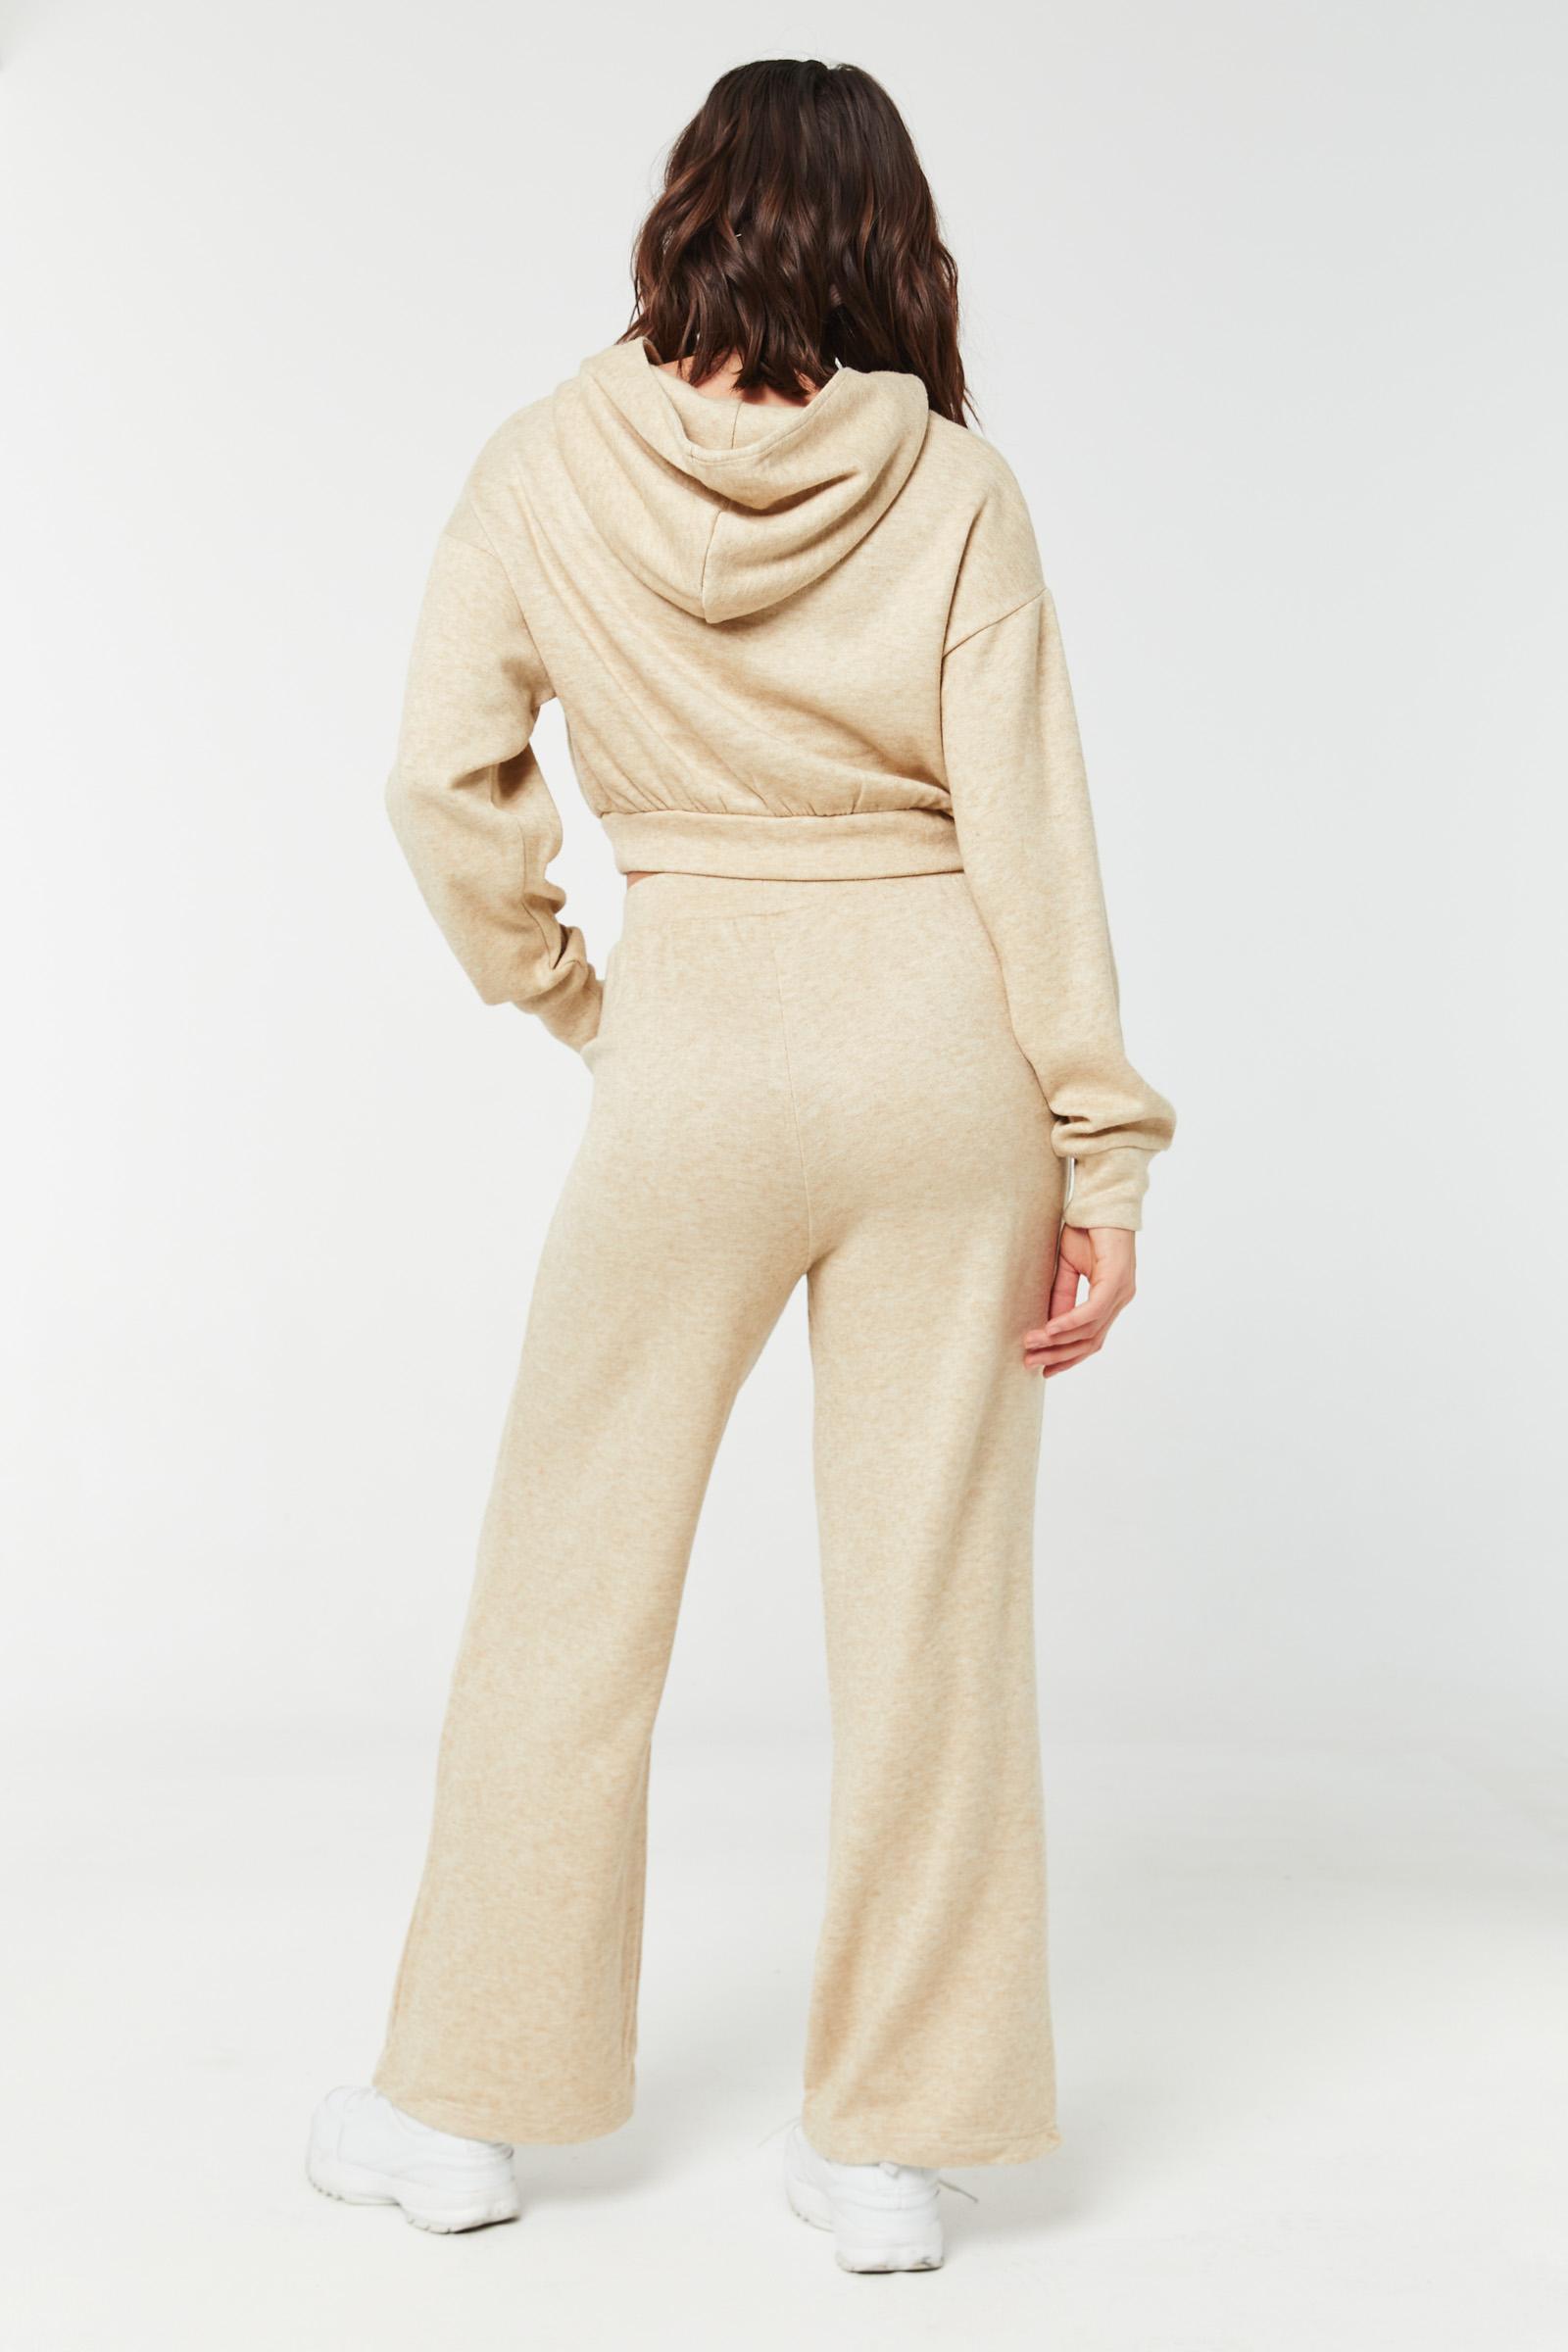 Pantalon slip-on jambe large en tricot épais